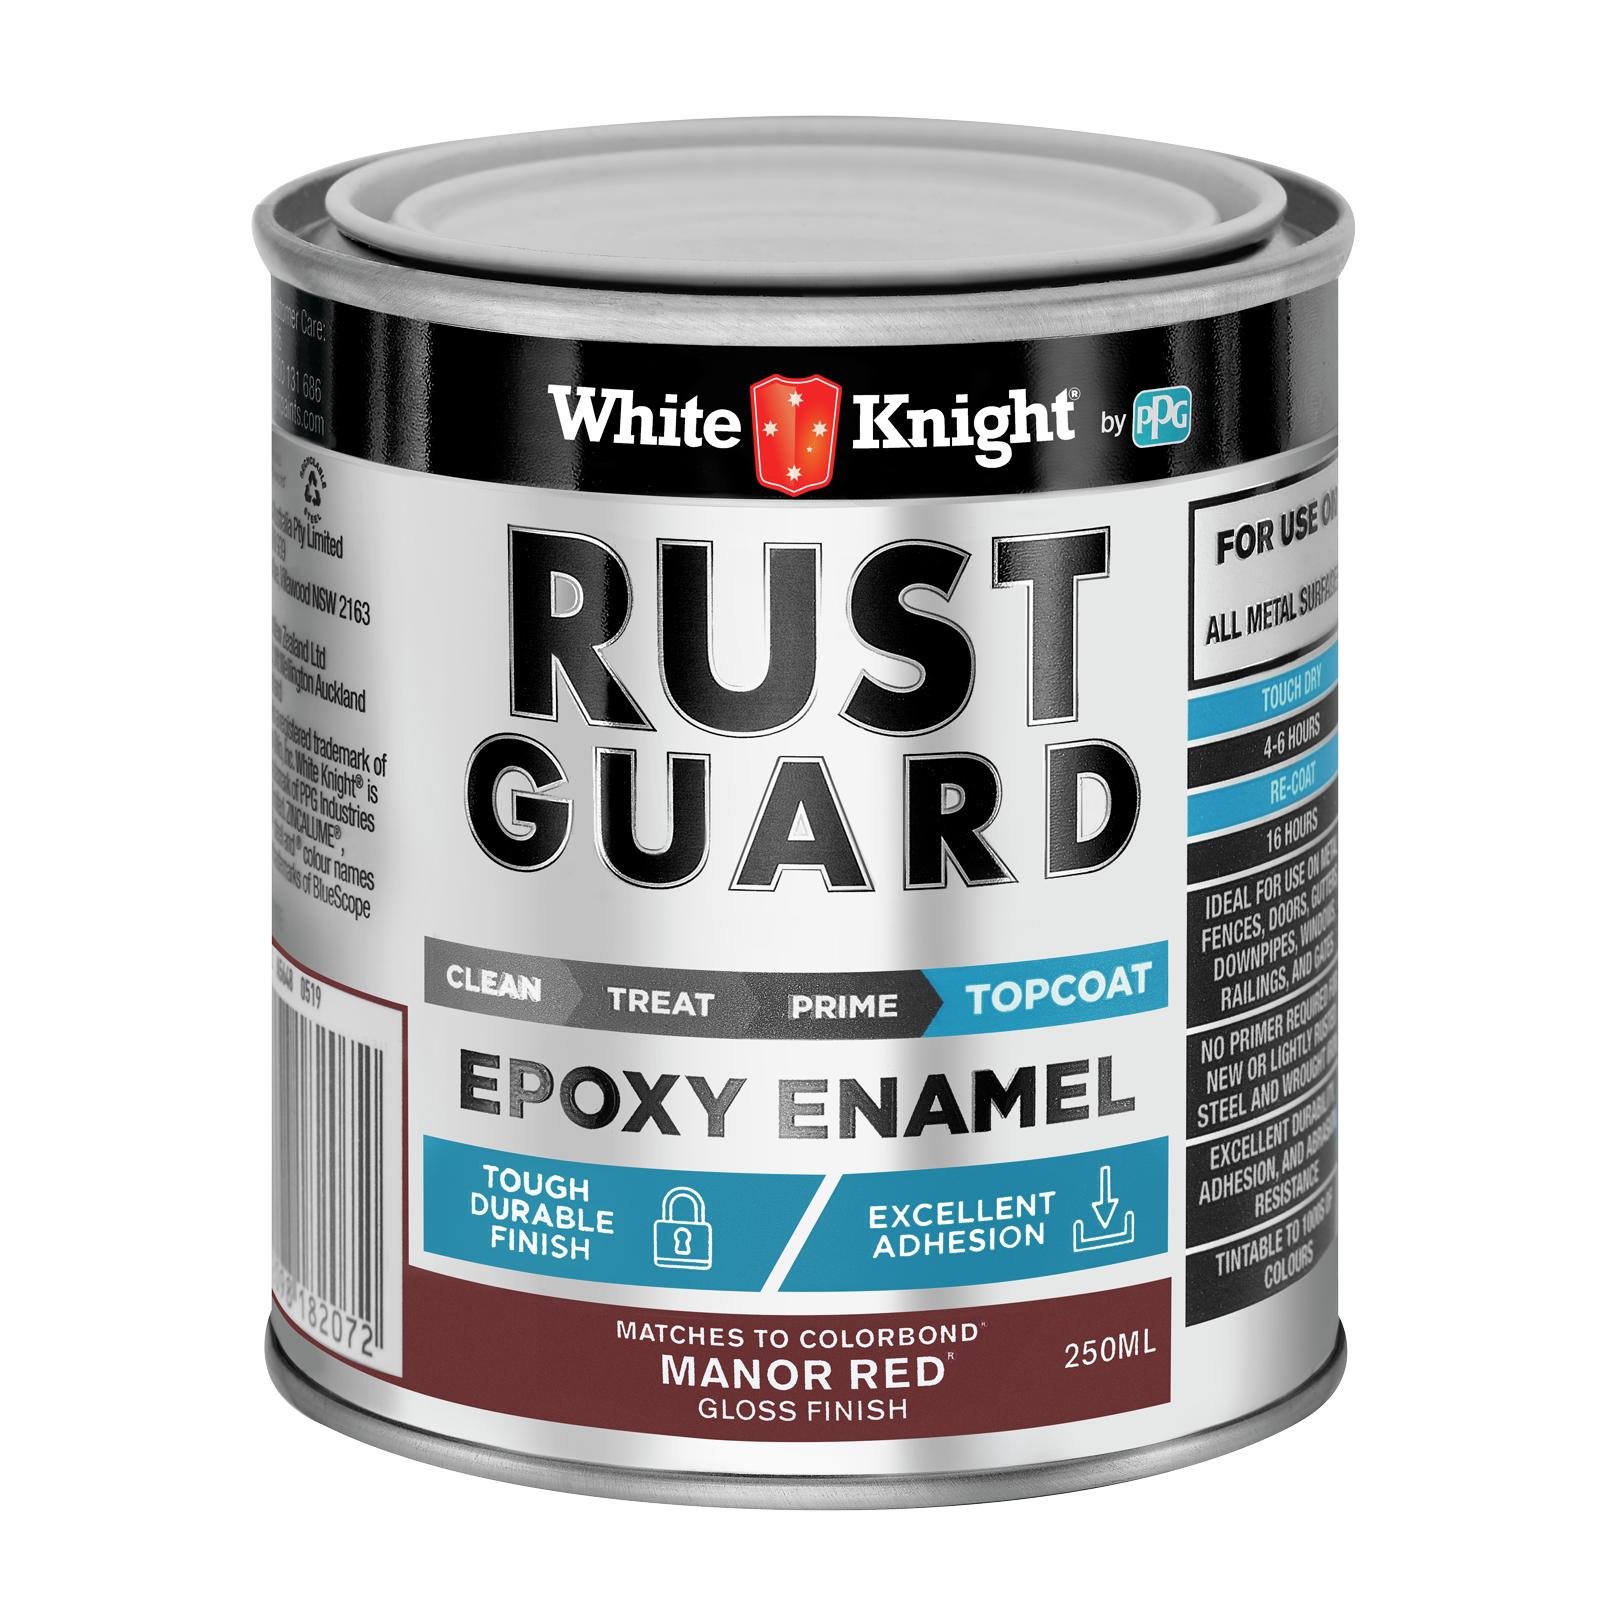 White Knight Rust Guard Gloss Manor Red Epoxy Enamel Paint - 0.25L